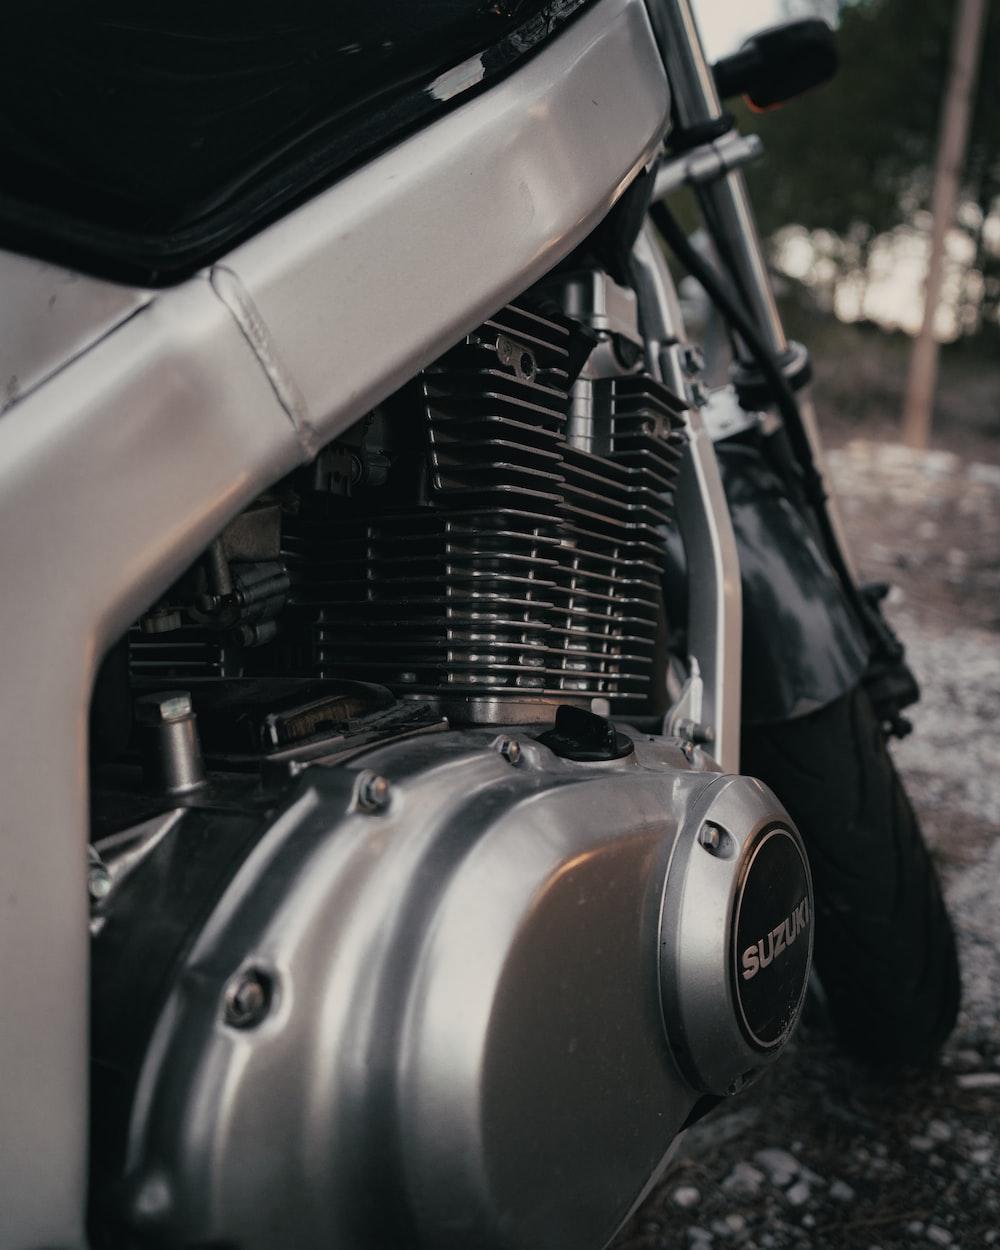 gray Suzuki motorcycle engine